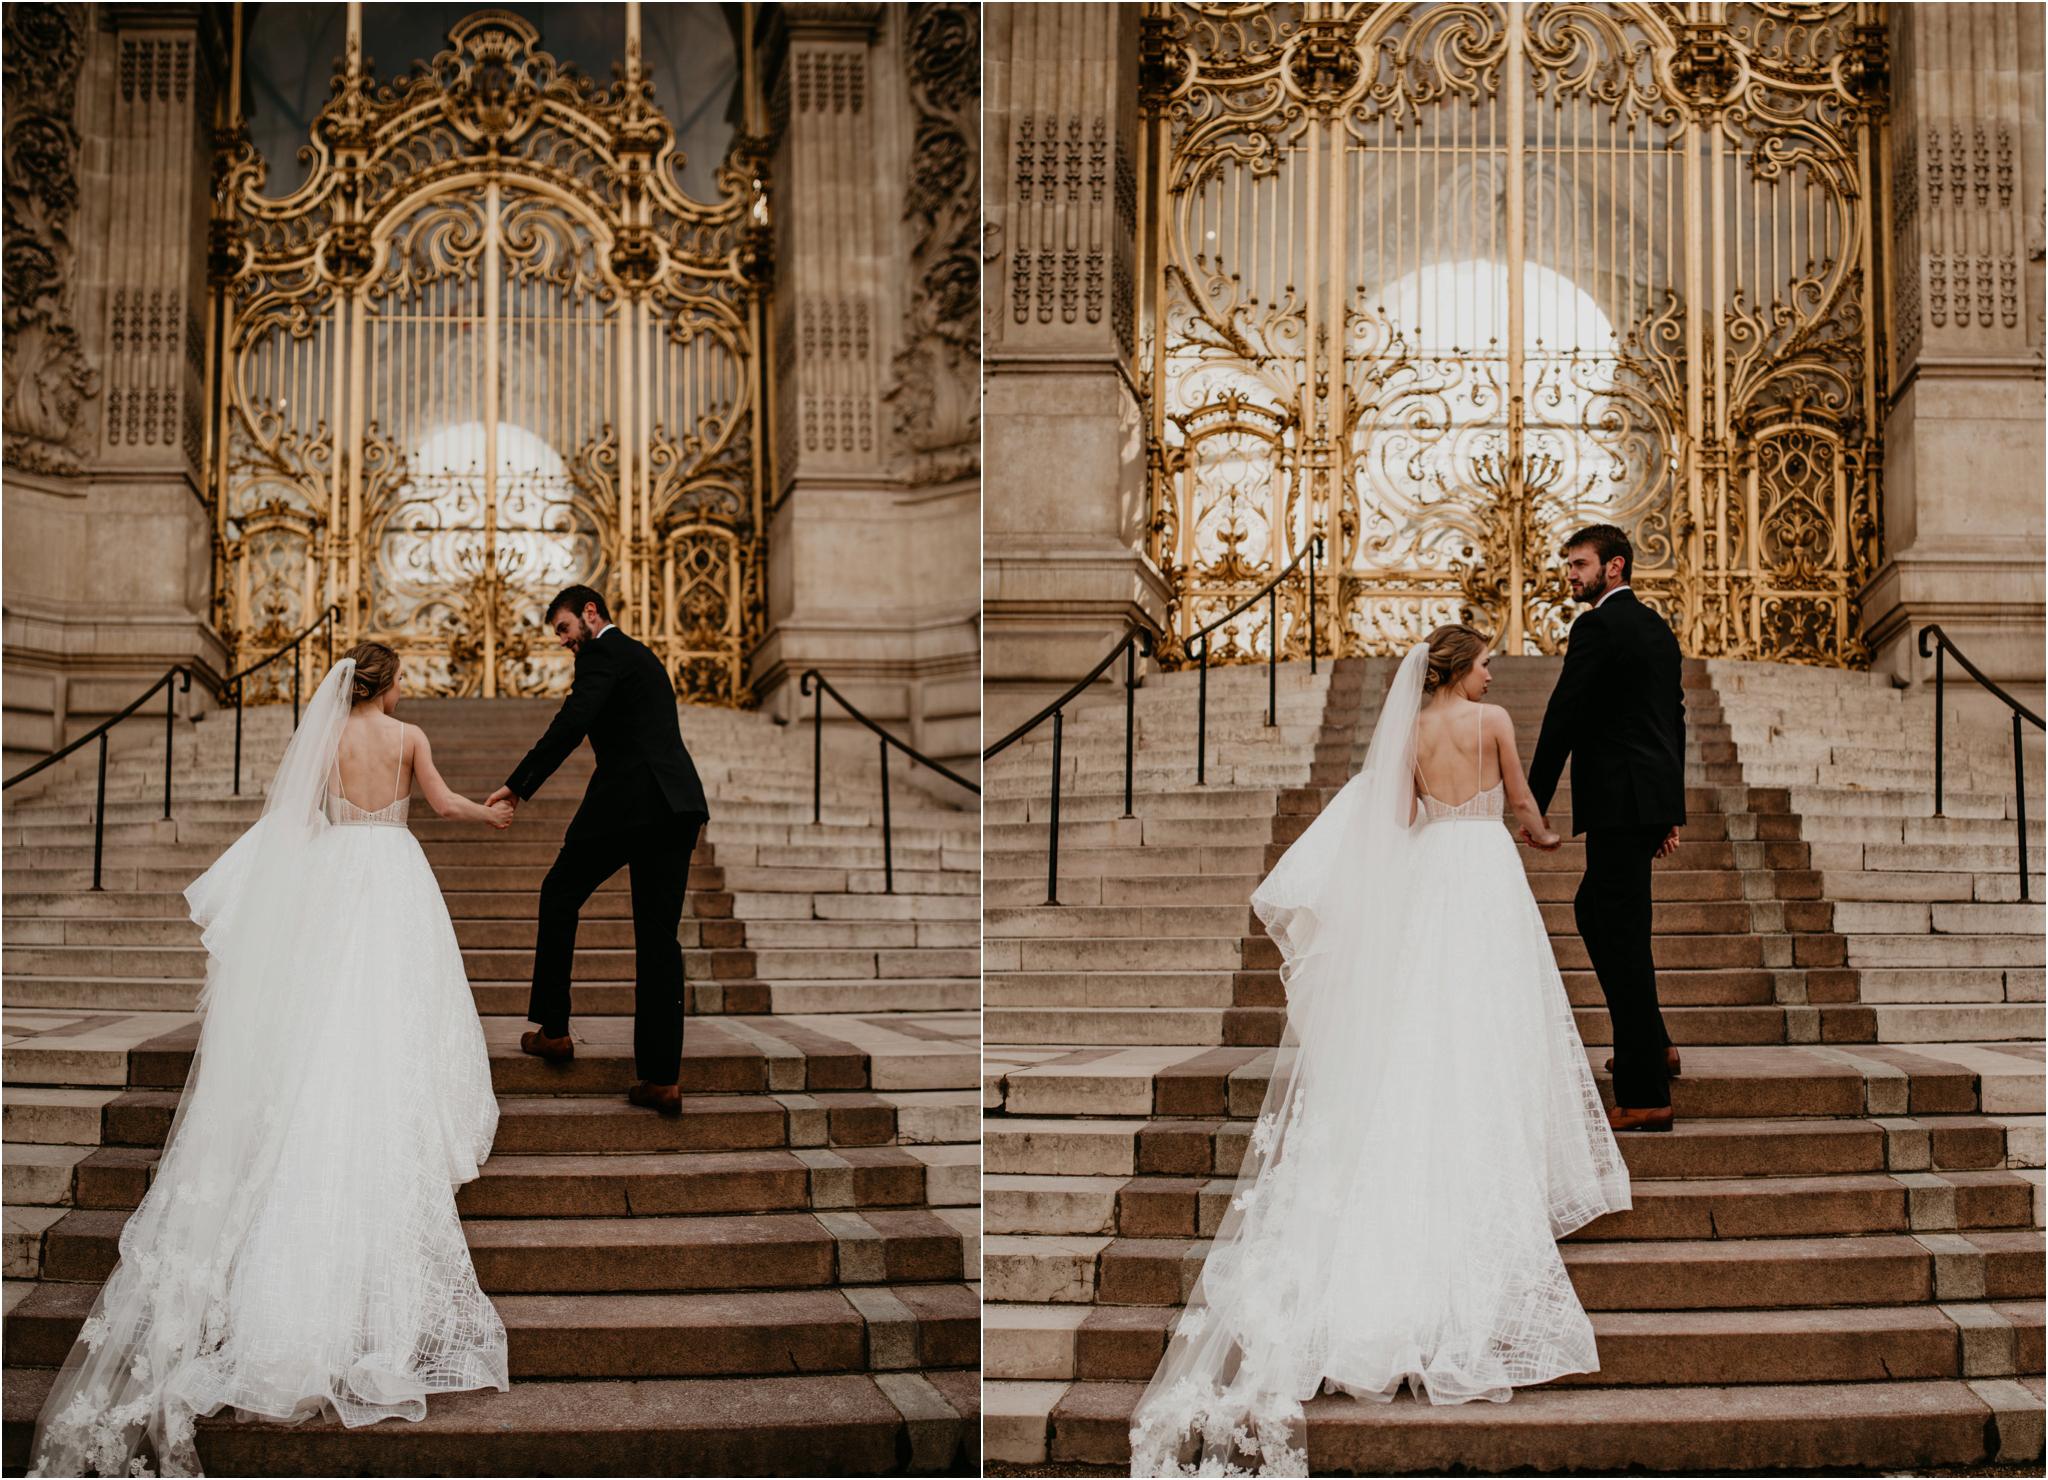 miranda-and-jared-paris-elopement-destination-wedding-photographer-075.jpg